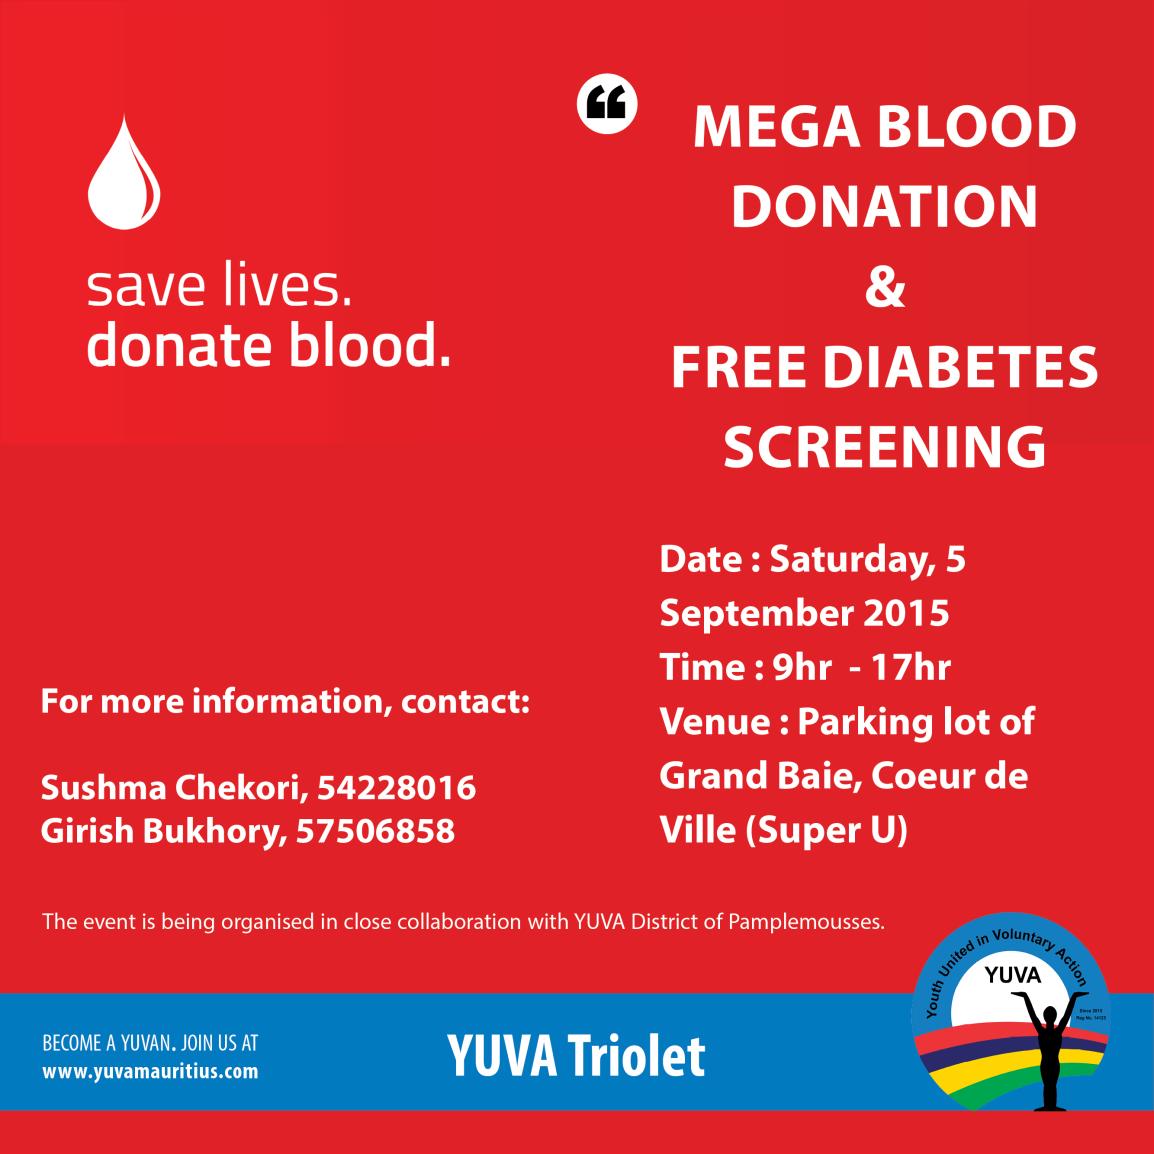 yuva-blood-poster